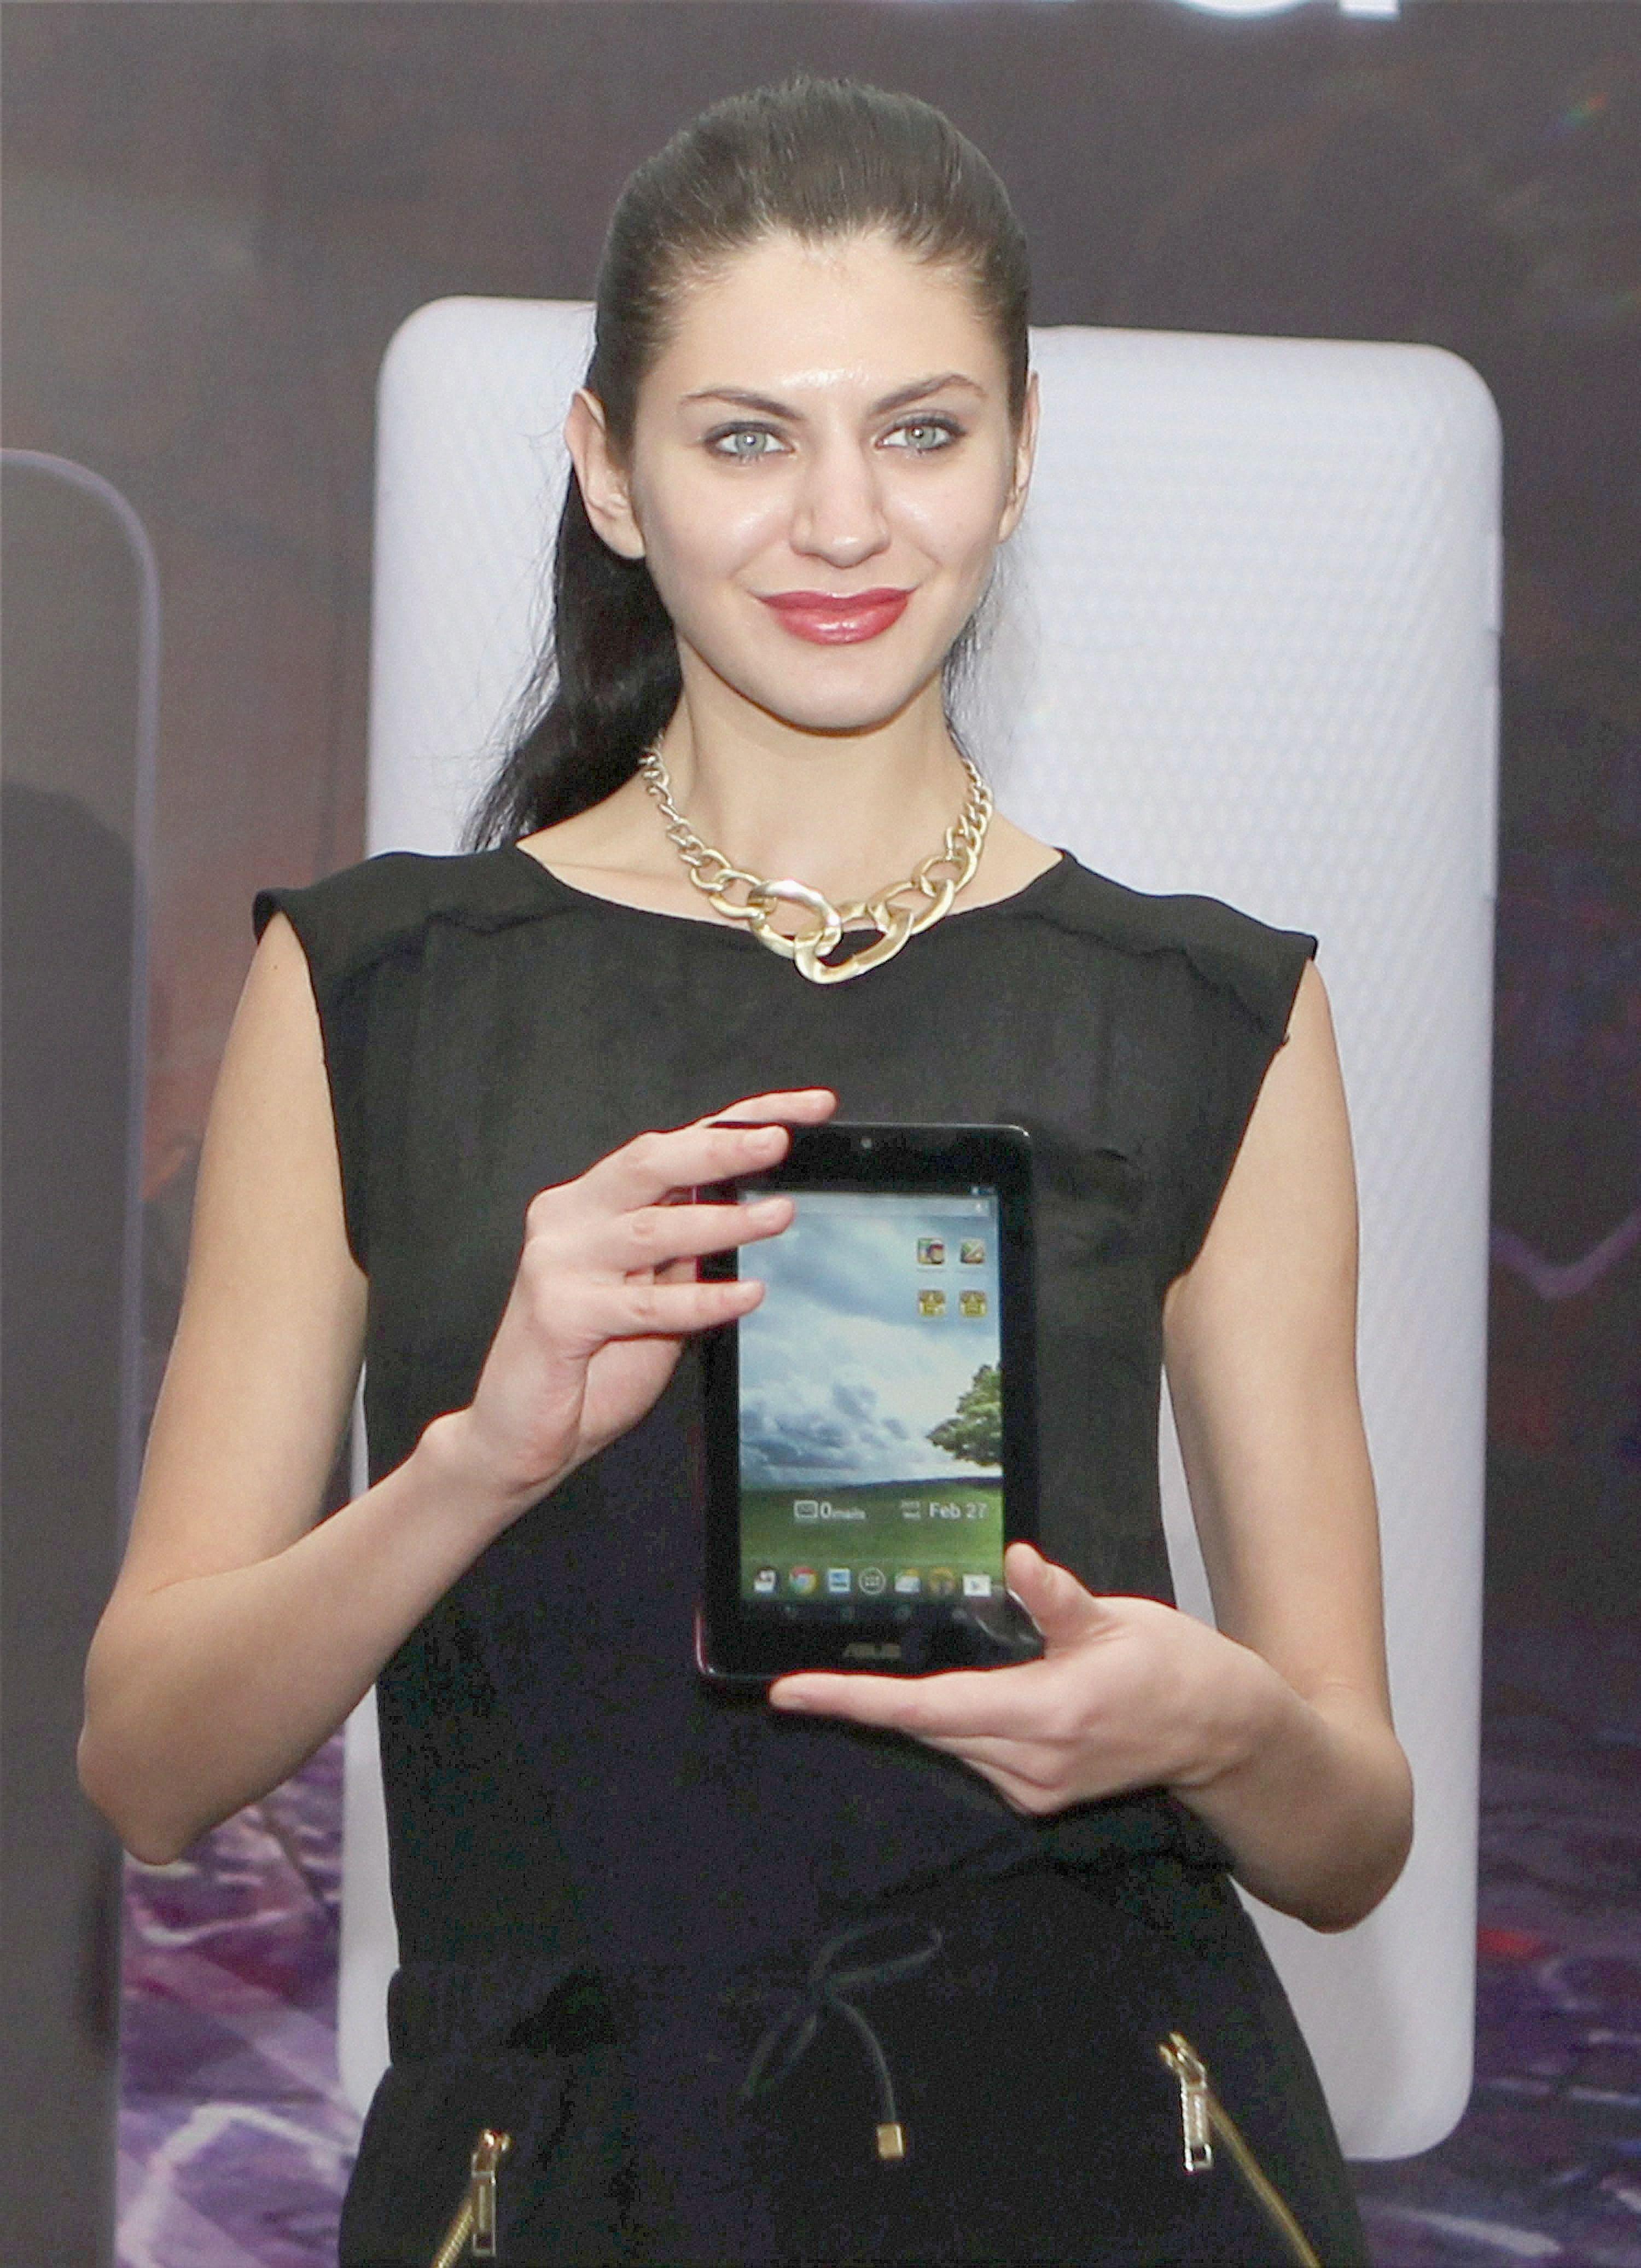 ASUS' New Tablet MeMO Pad at Rs 9999